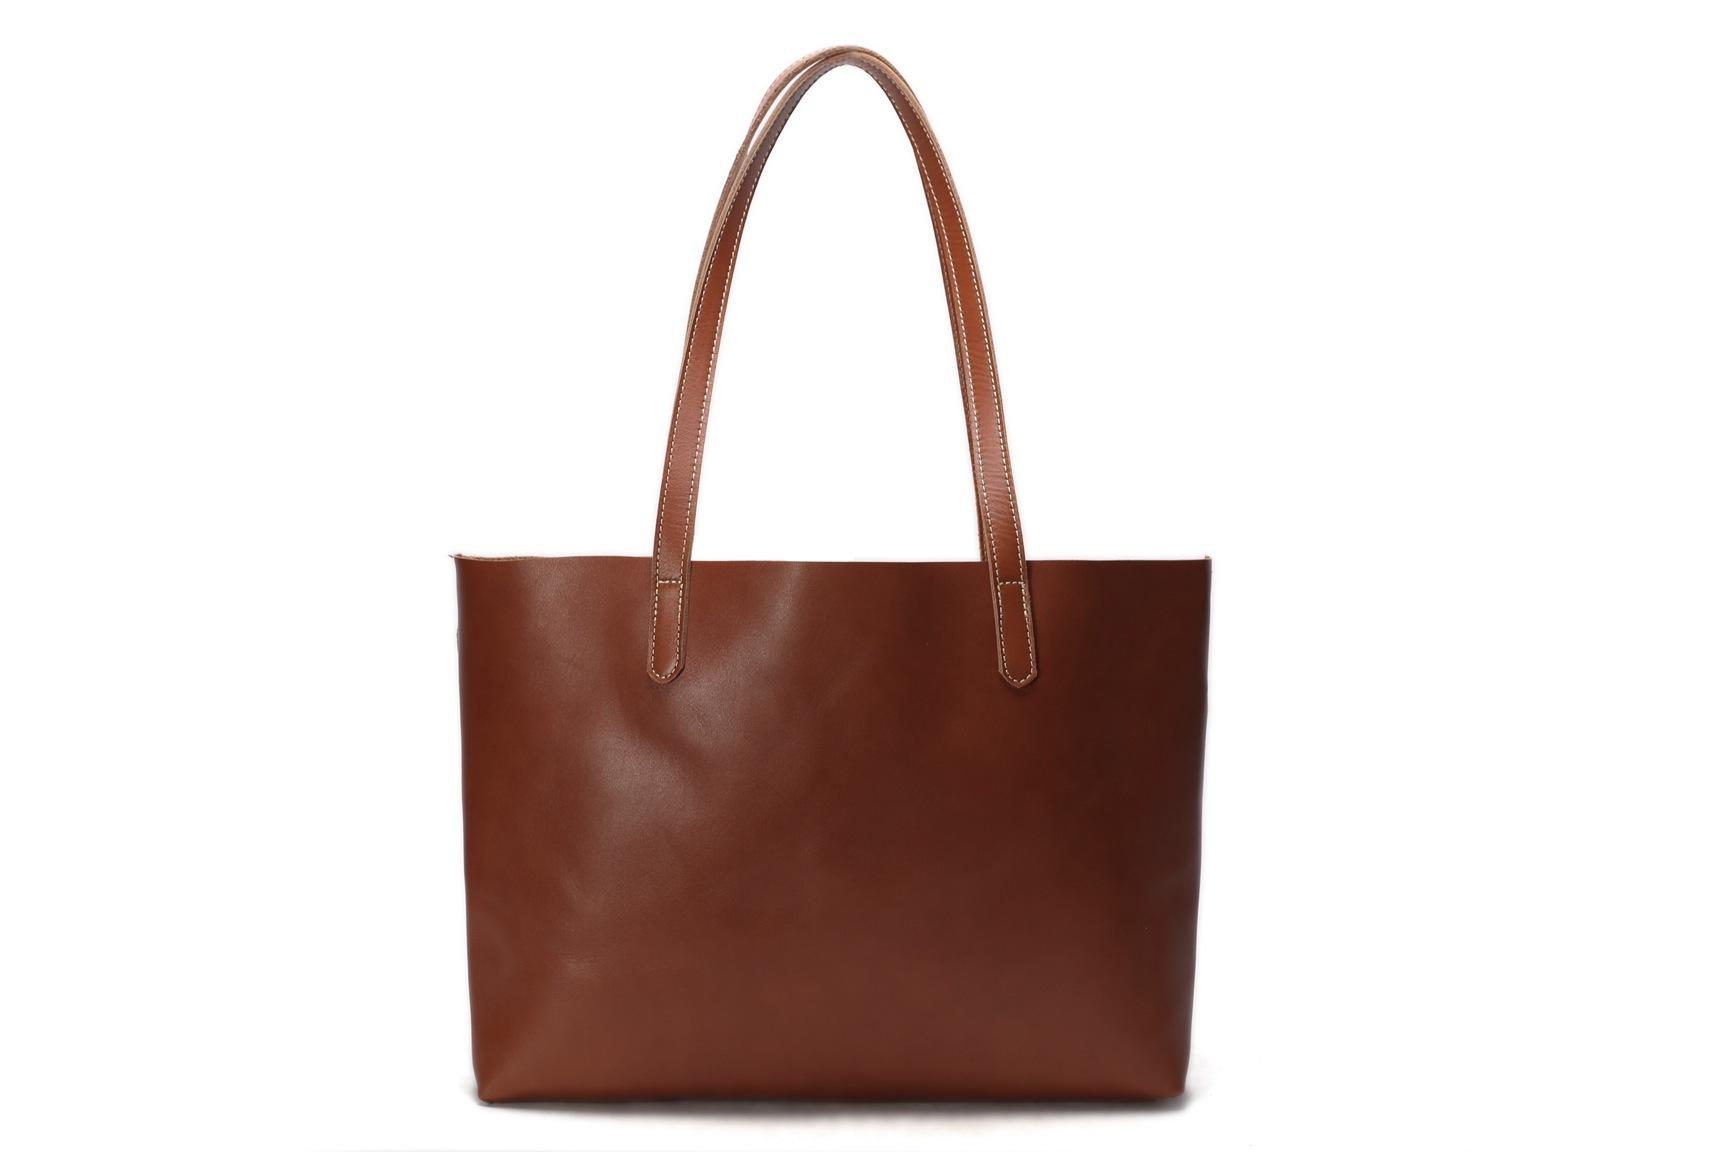 b85b80821b40 Vintage Genuine Leather Women Tote Bag   Shopping Bag   Shoulder Bag ZB01